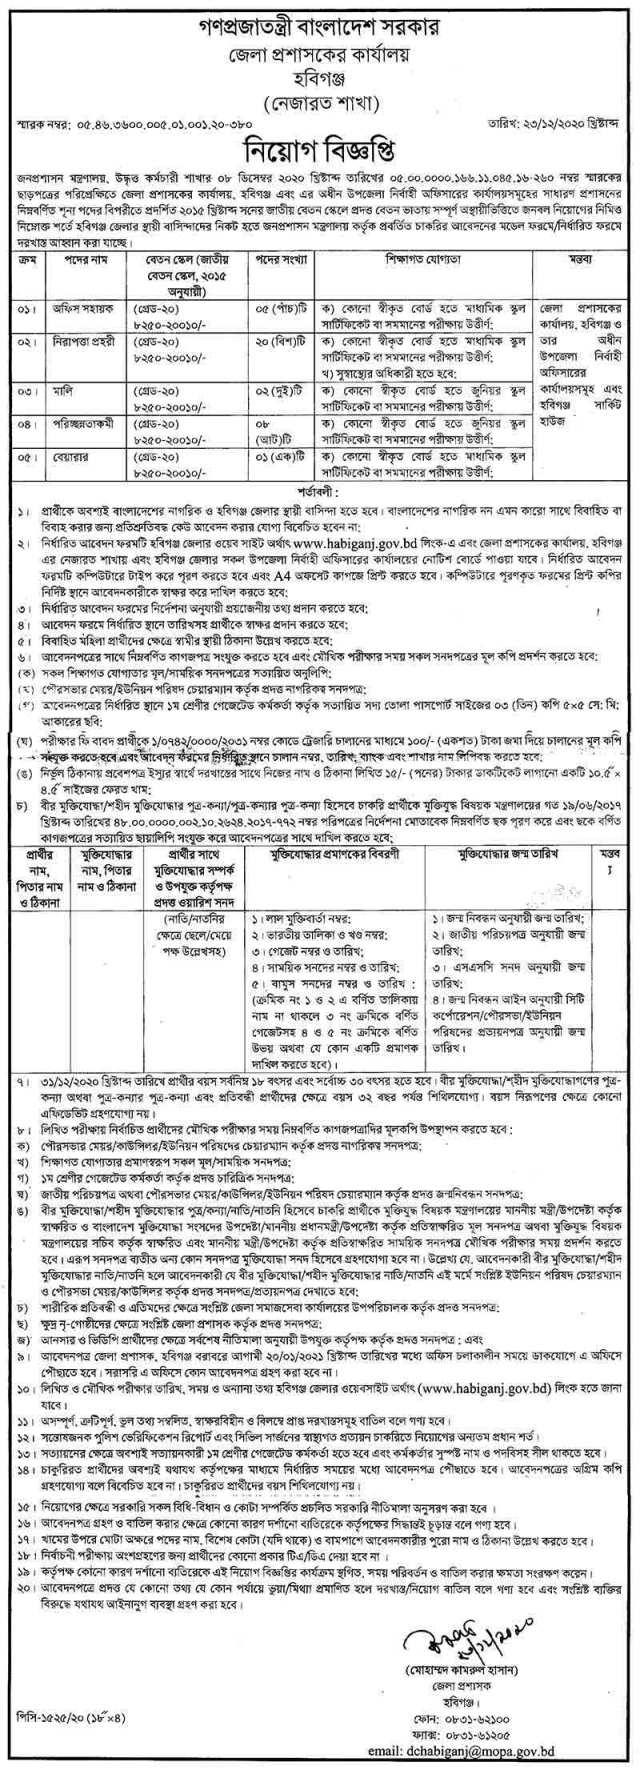 Habiganj District Commissioner Office Job Circular 2021 (Image)